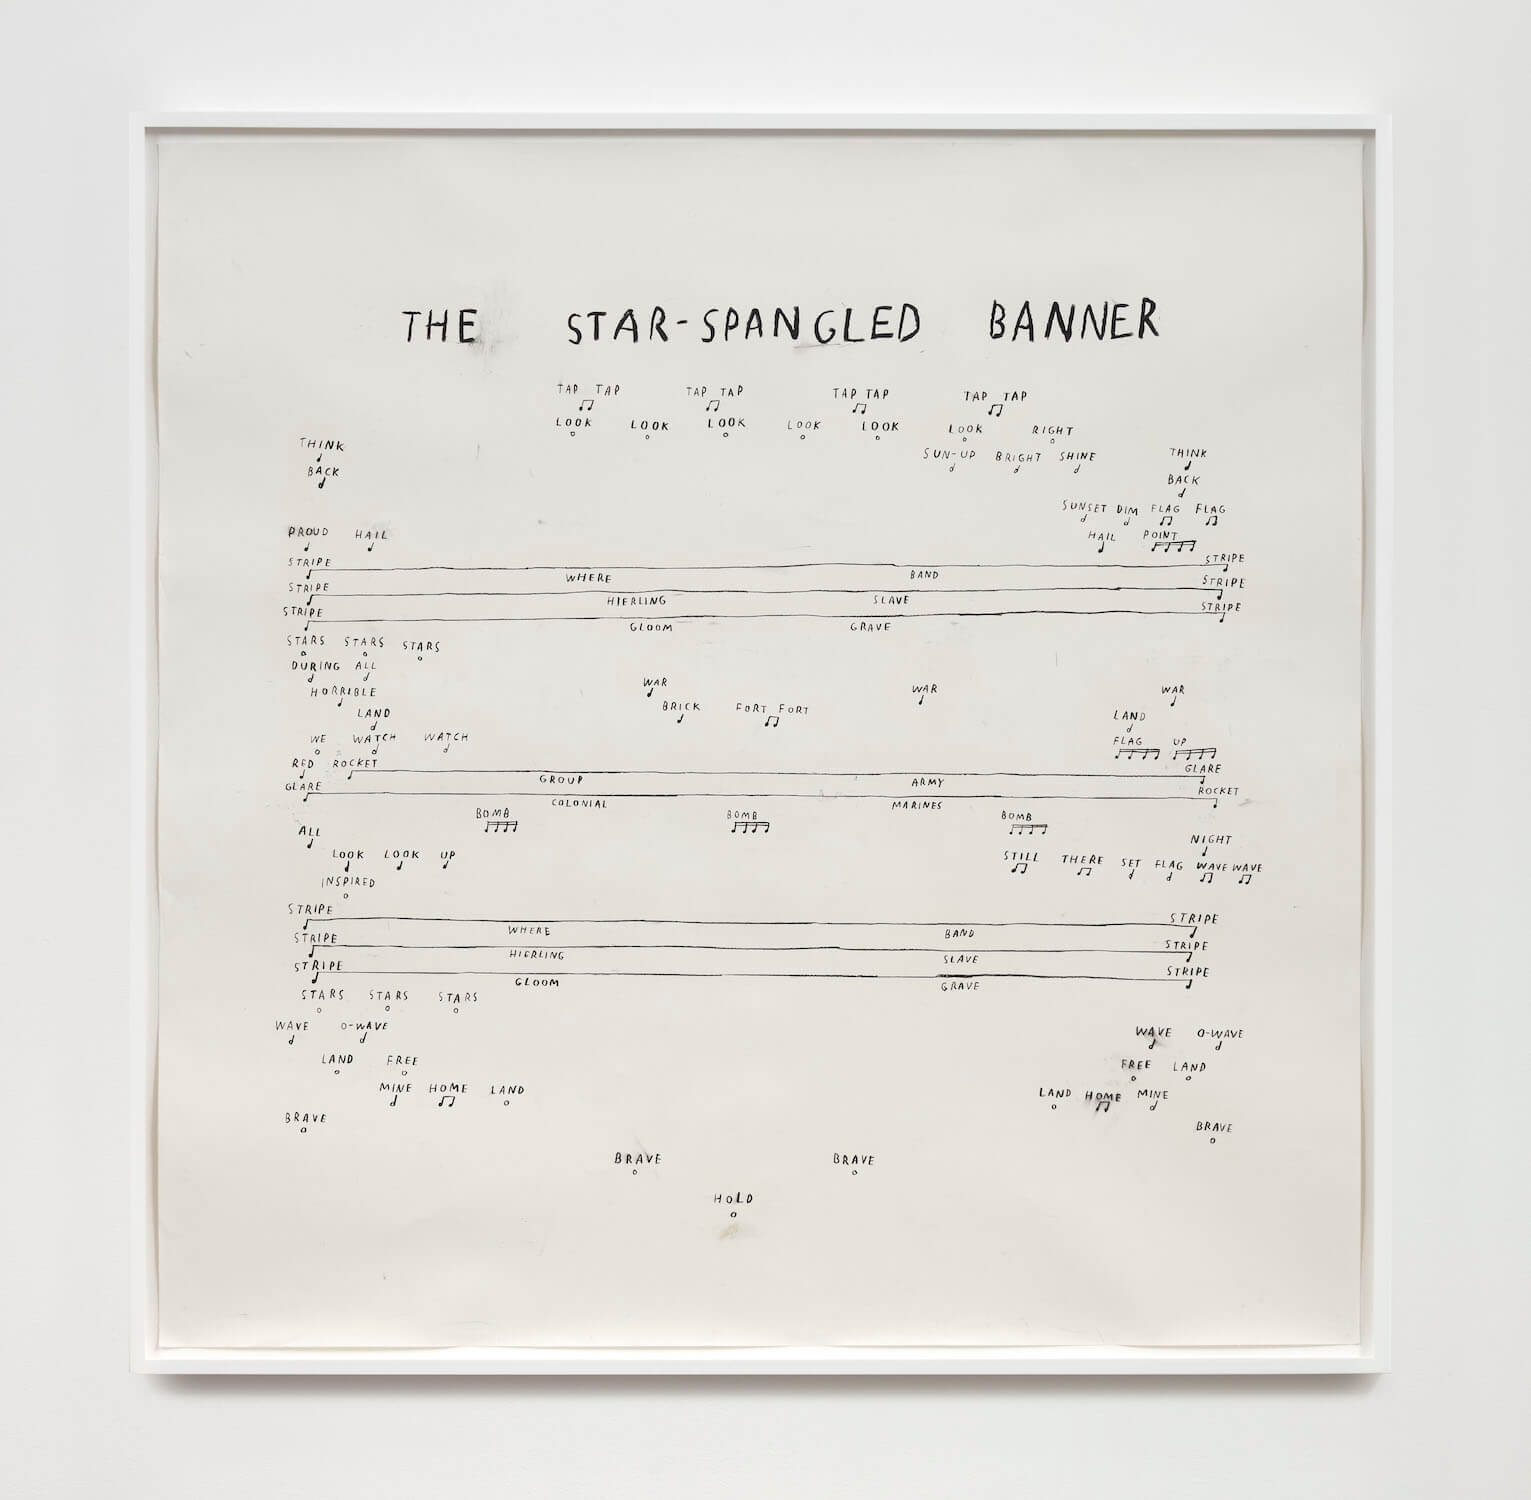 Kim, The Star-Spangled Banner (Third Verse), 2020 (CSK 20.019) A